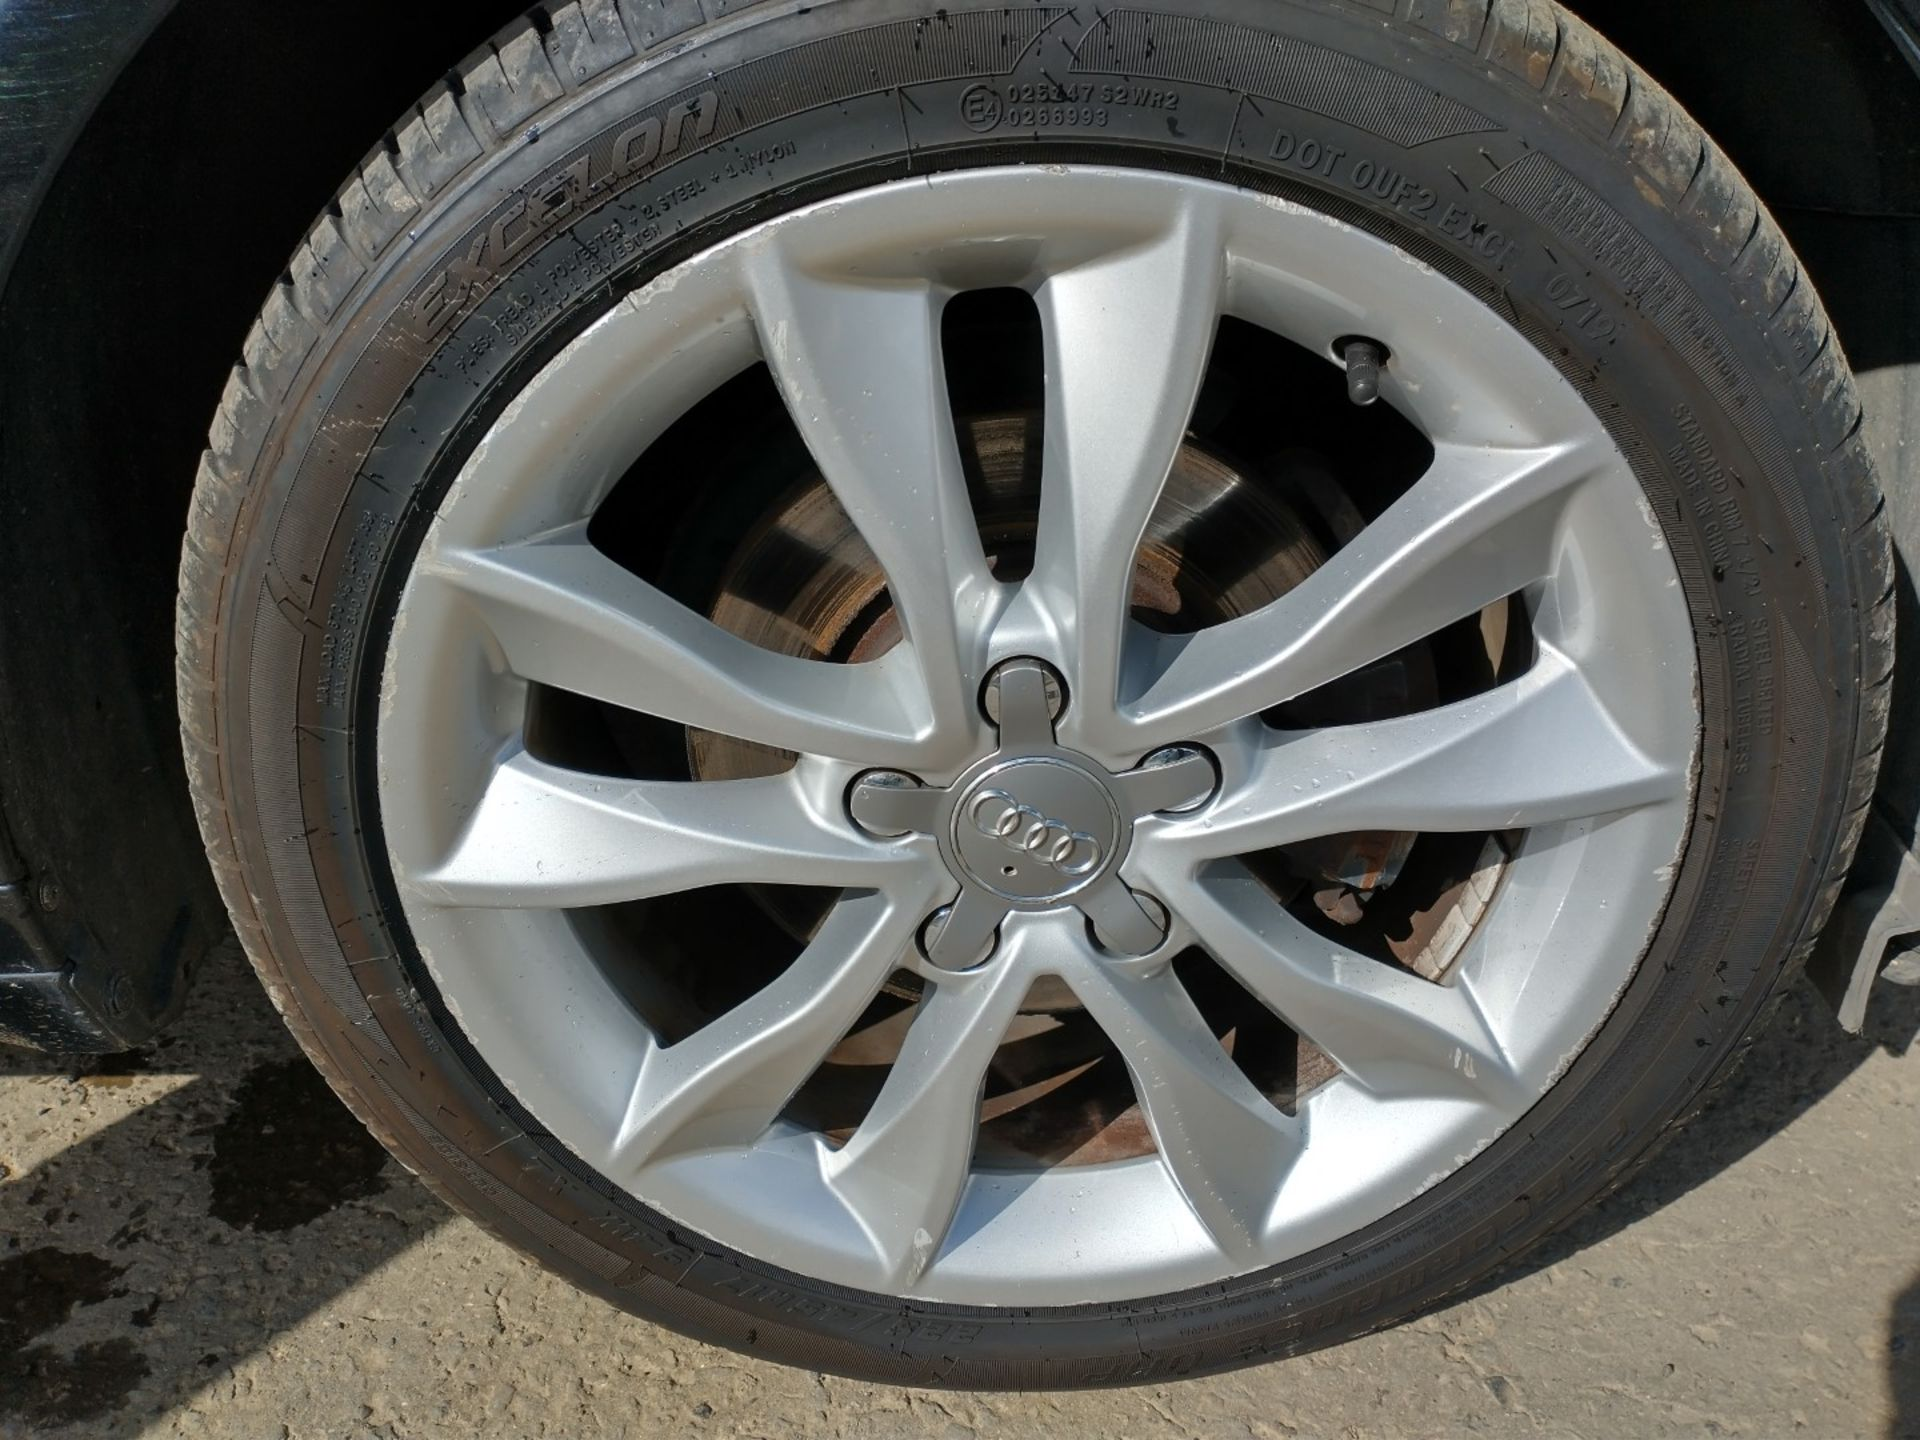 2012 Audi A3 Sportback 1.6 Tdi Hatchback - Full Service History - CL505 - NO VAT ON THE HAMMER - - Image 23 of 26